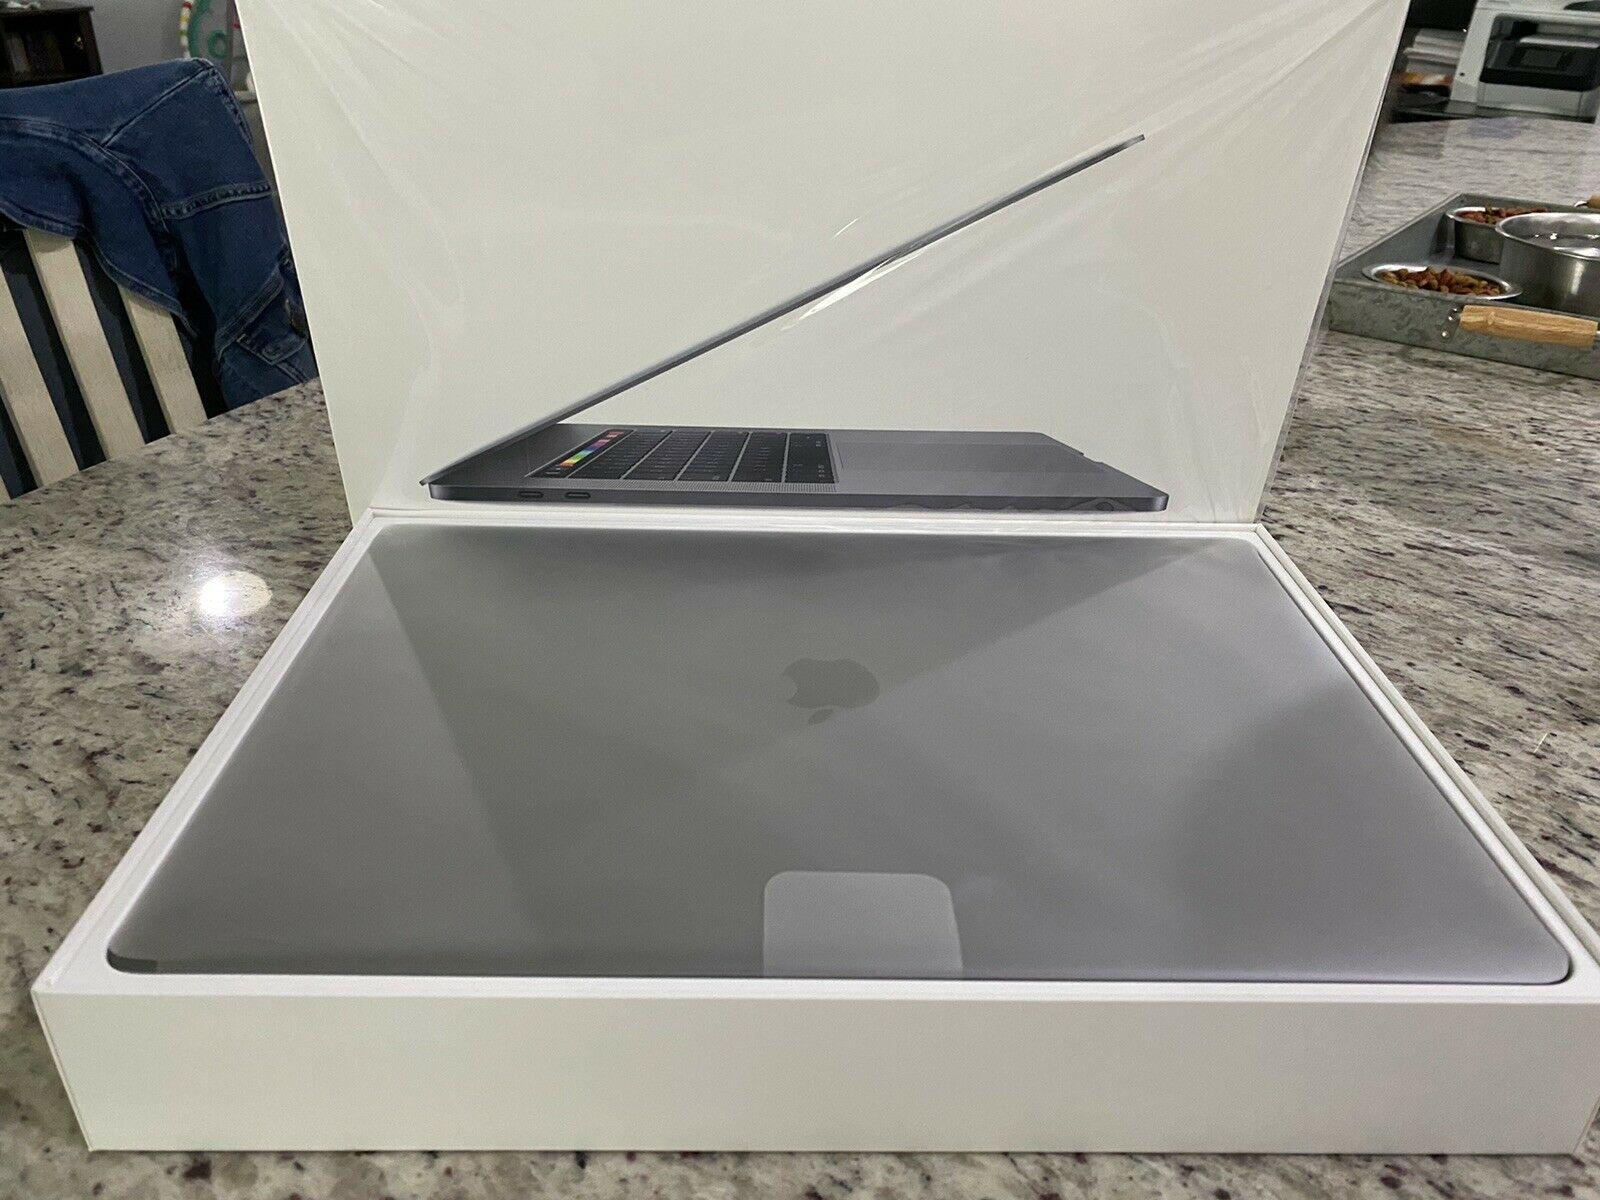 "Apple MacBook Pro 15"" 2.9GHz Core i7 Apple MacBook Pro 15"" 2.9GHz Core i7"